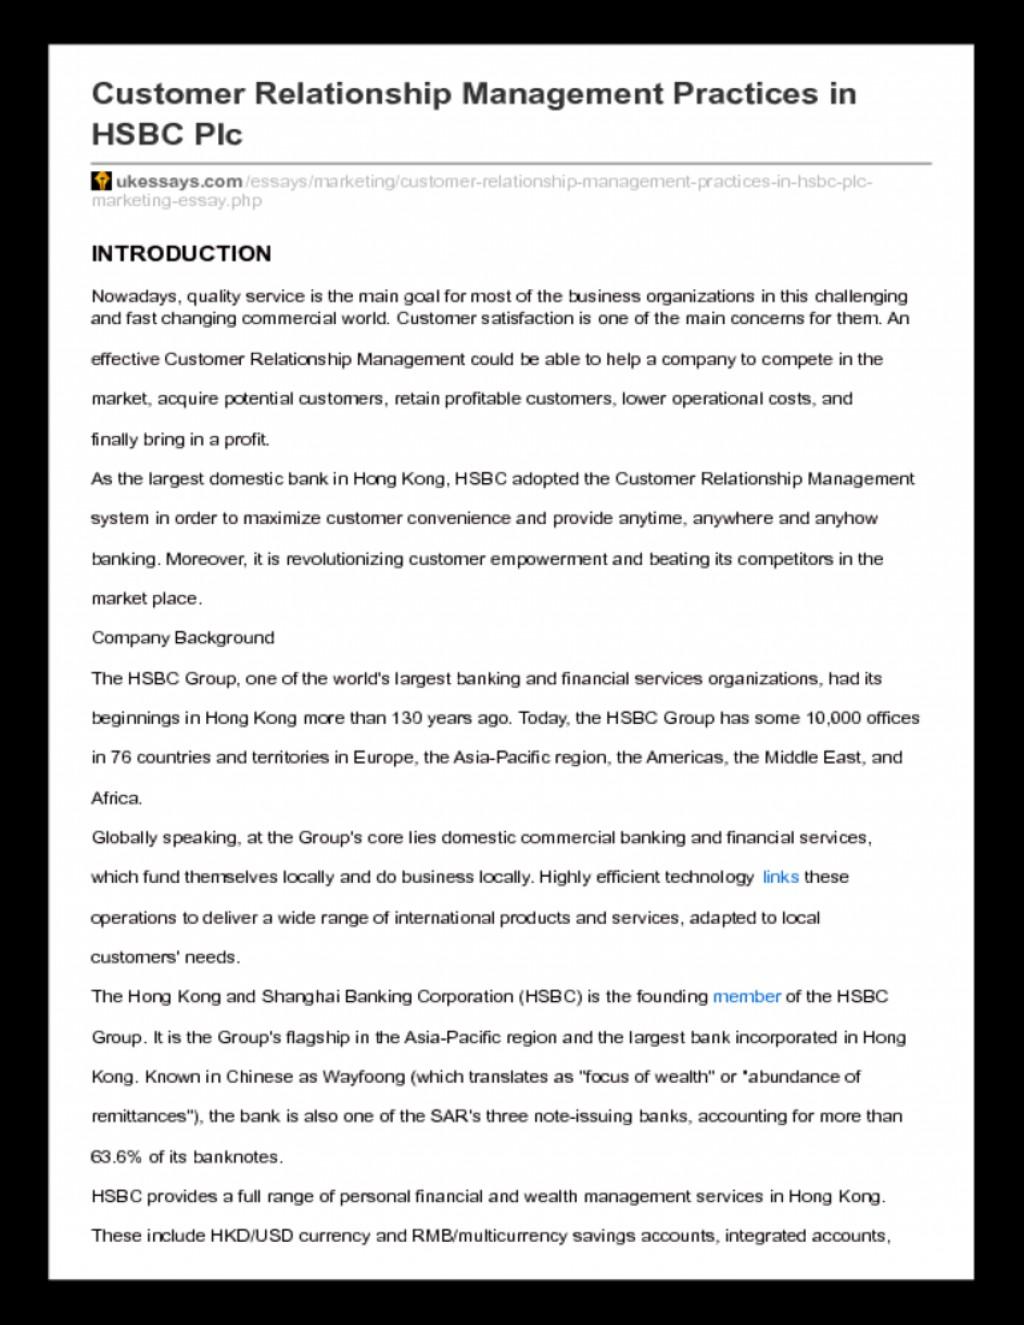 022 Essay Example Uk Essays Customer20relationship20management20class20notes 258461120 Ukessays Com Customer Relationship Management Practices In Hsbc Stupendous New Reviews Apa Login Large